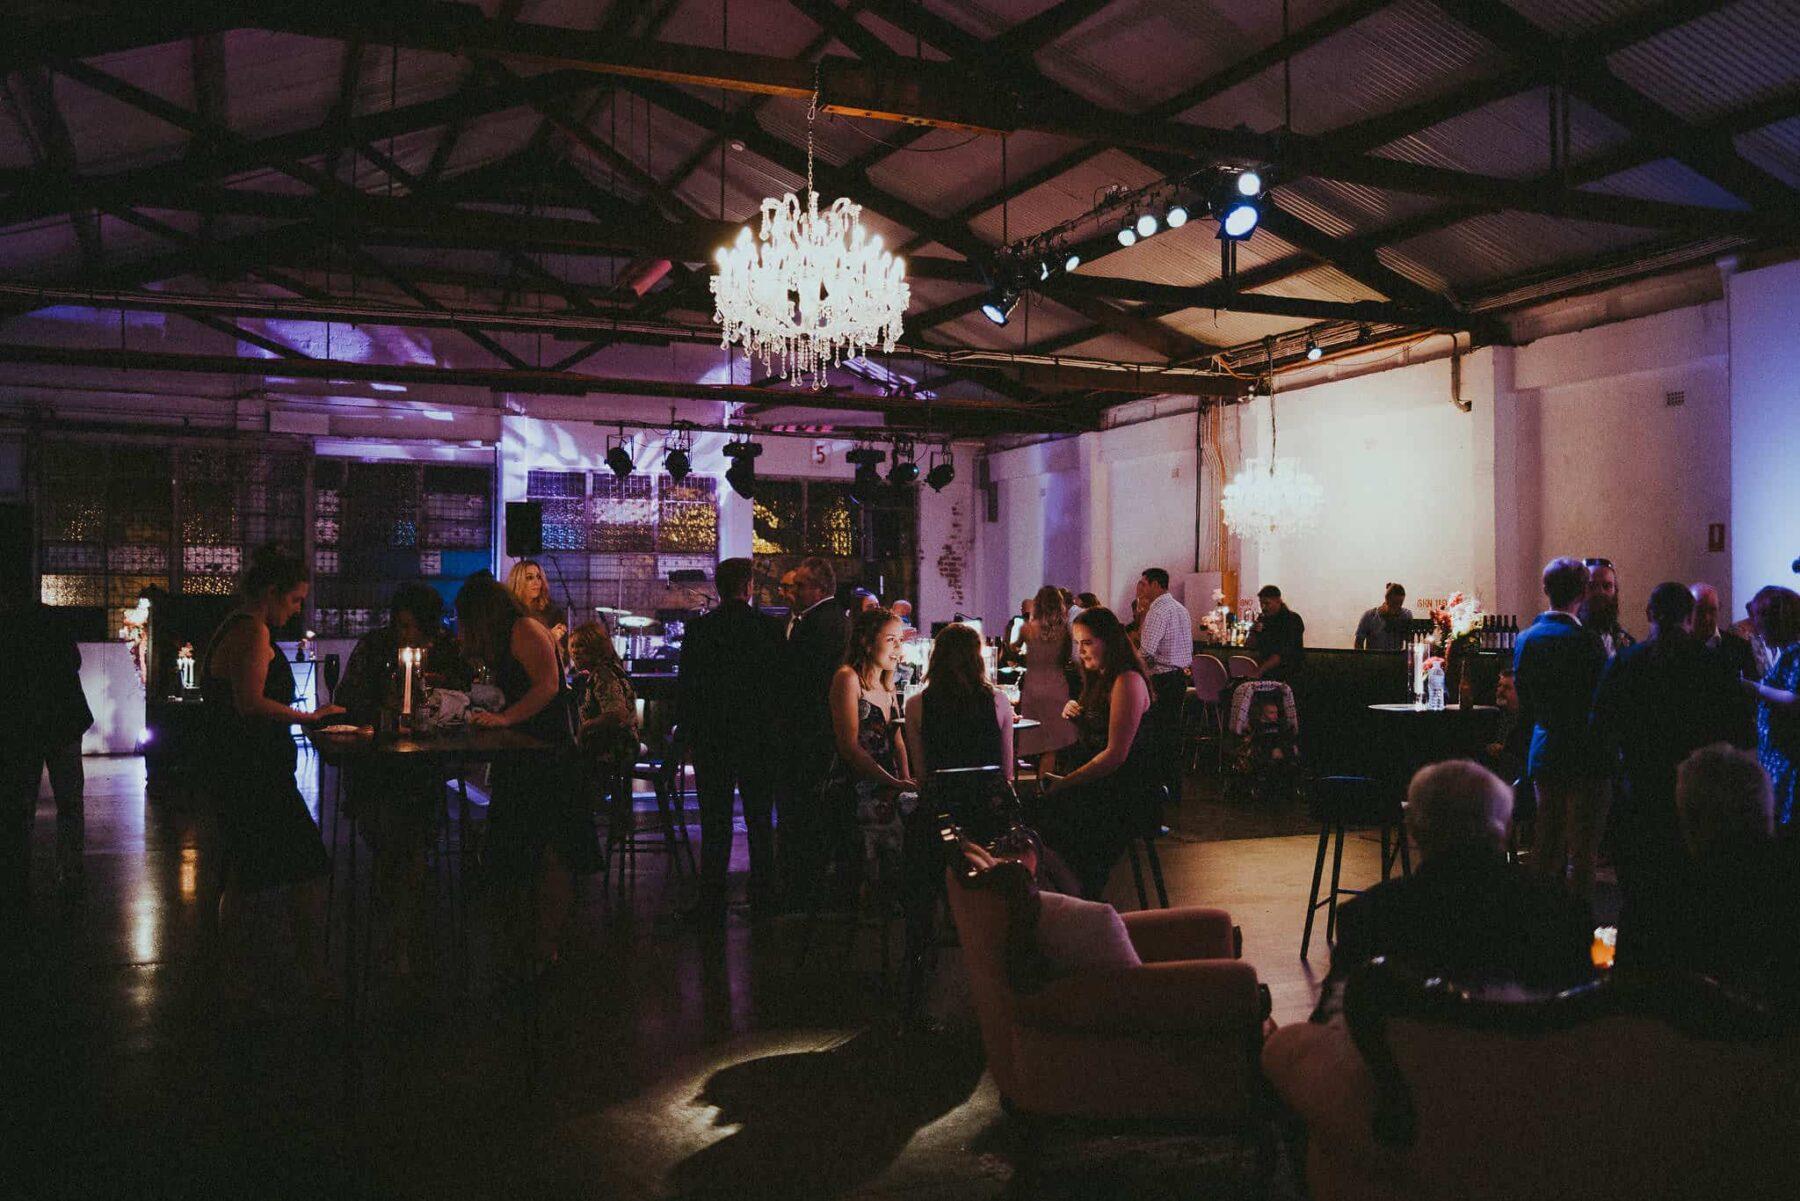 industrial Perth wedding at Fridays Studio - photography by Tanya Voltchanskaya